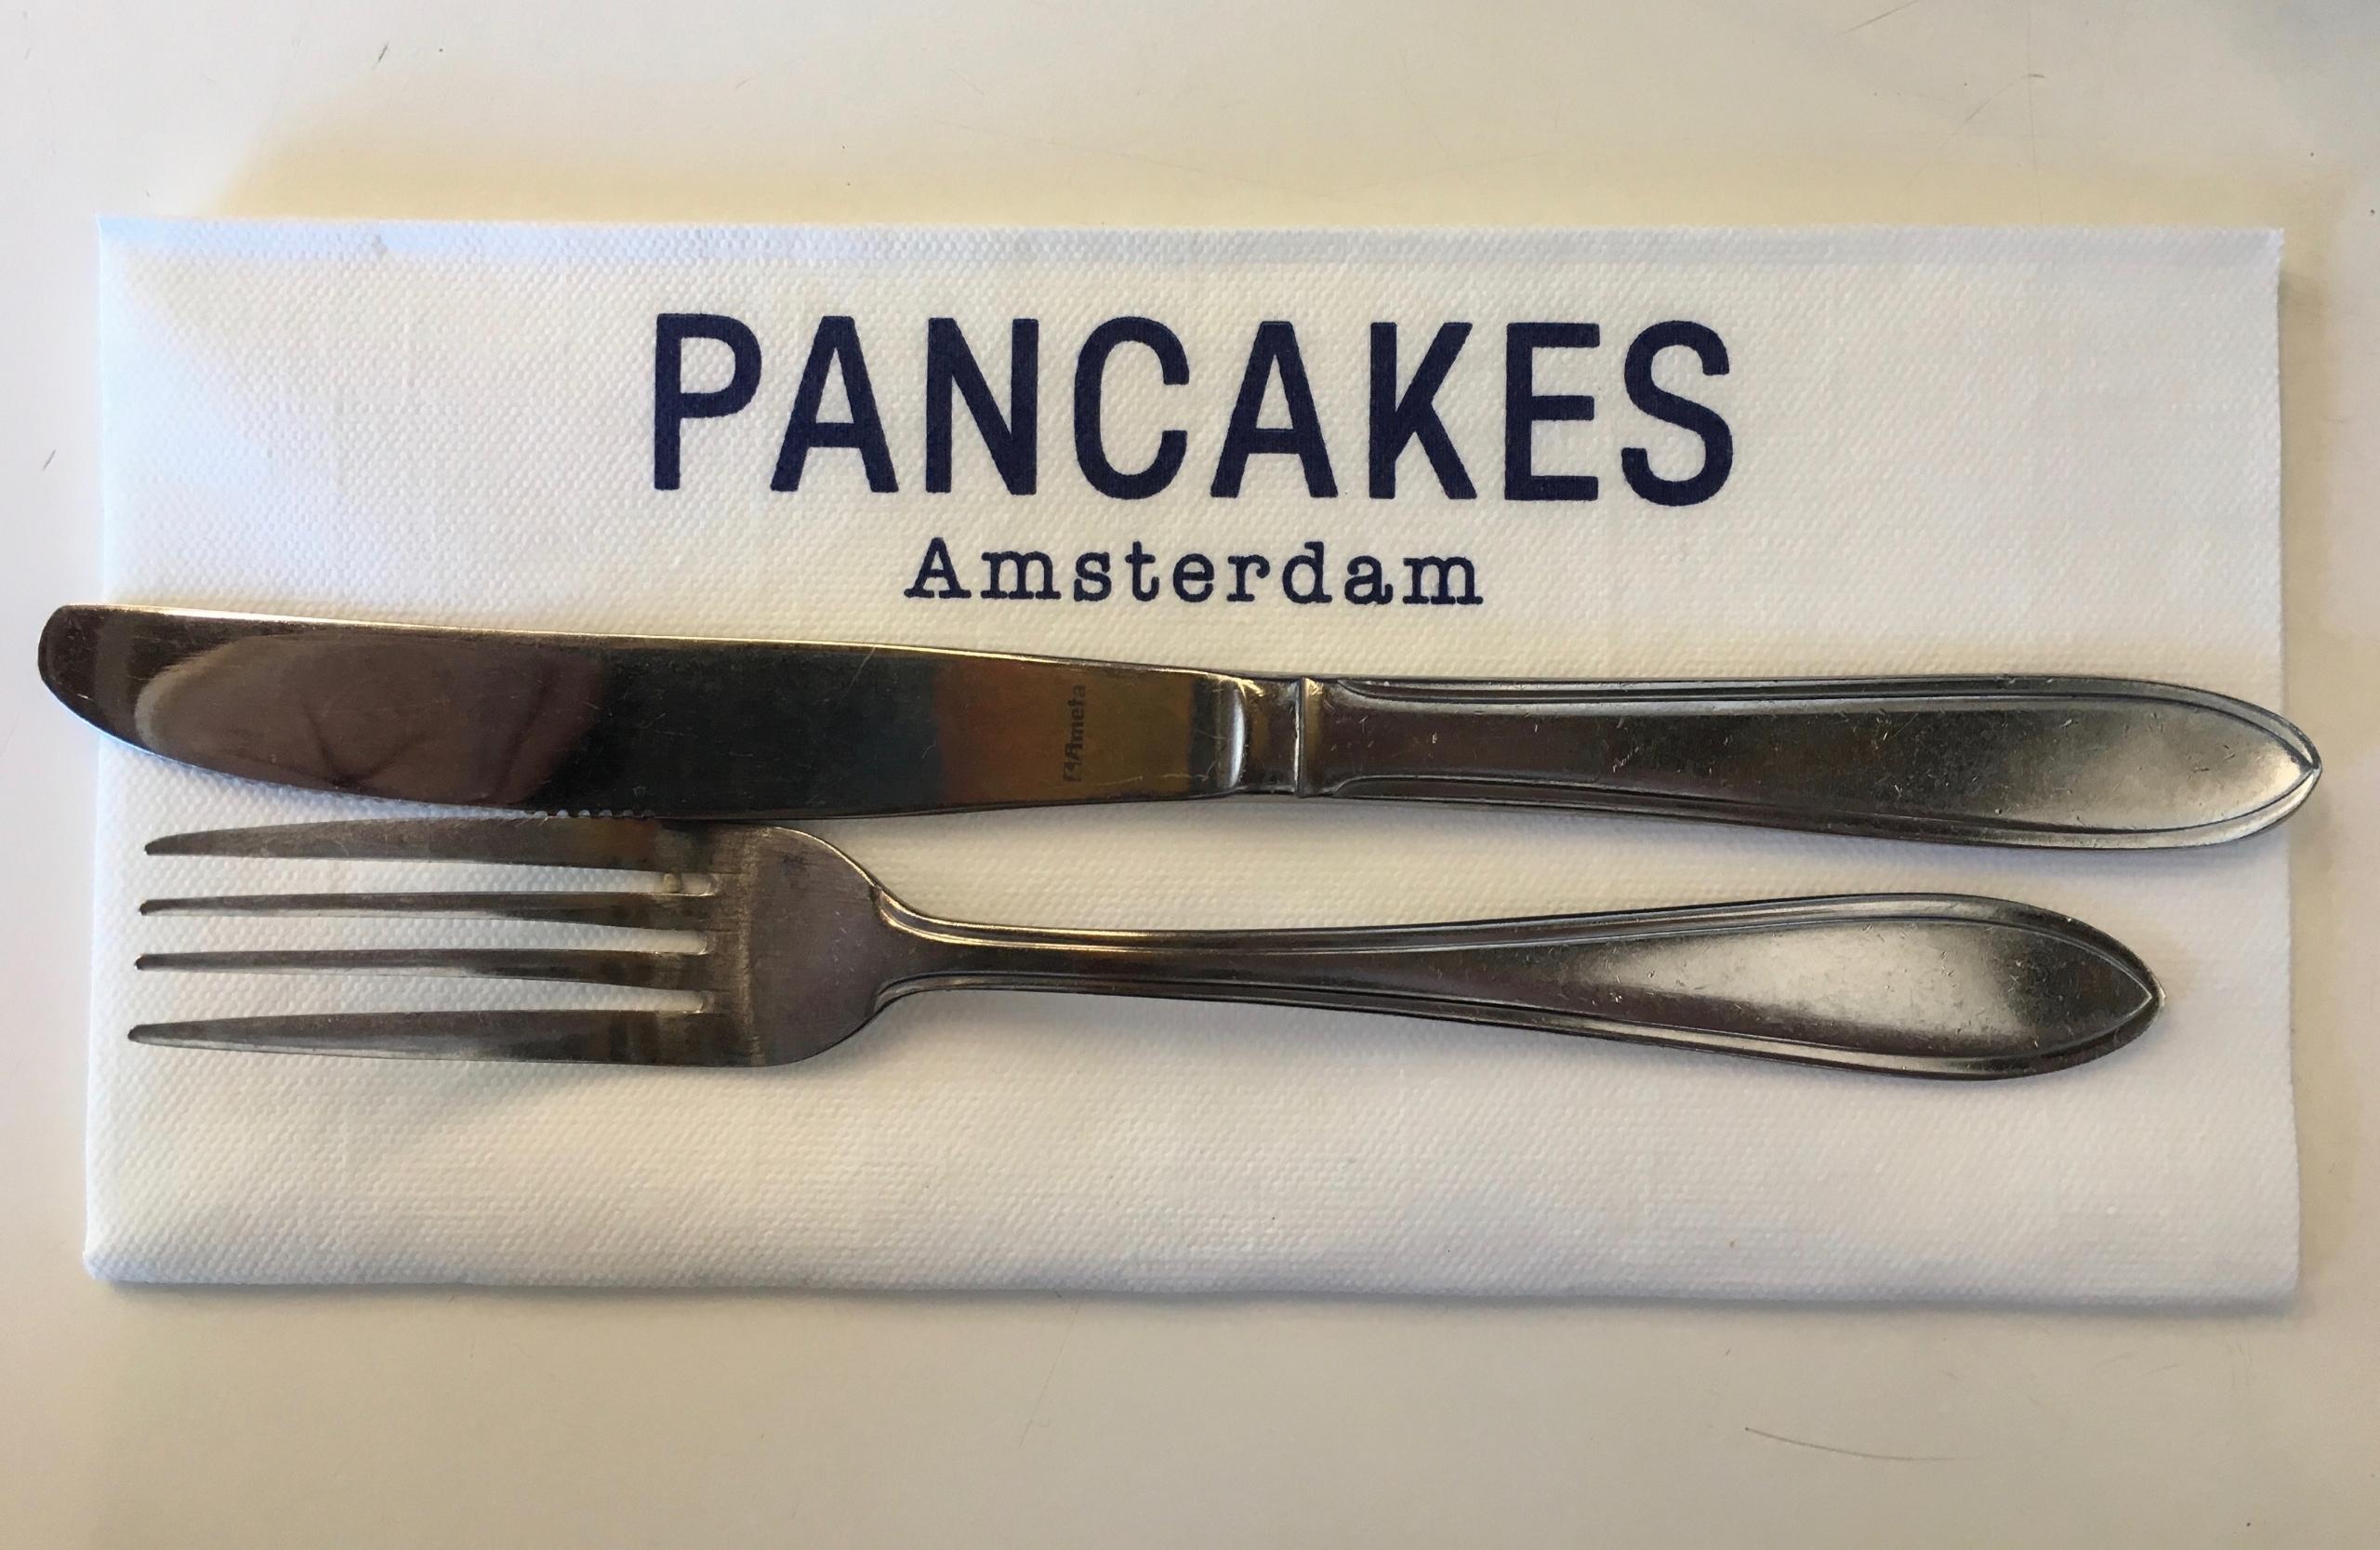 PancakesInAmsterdam